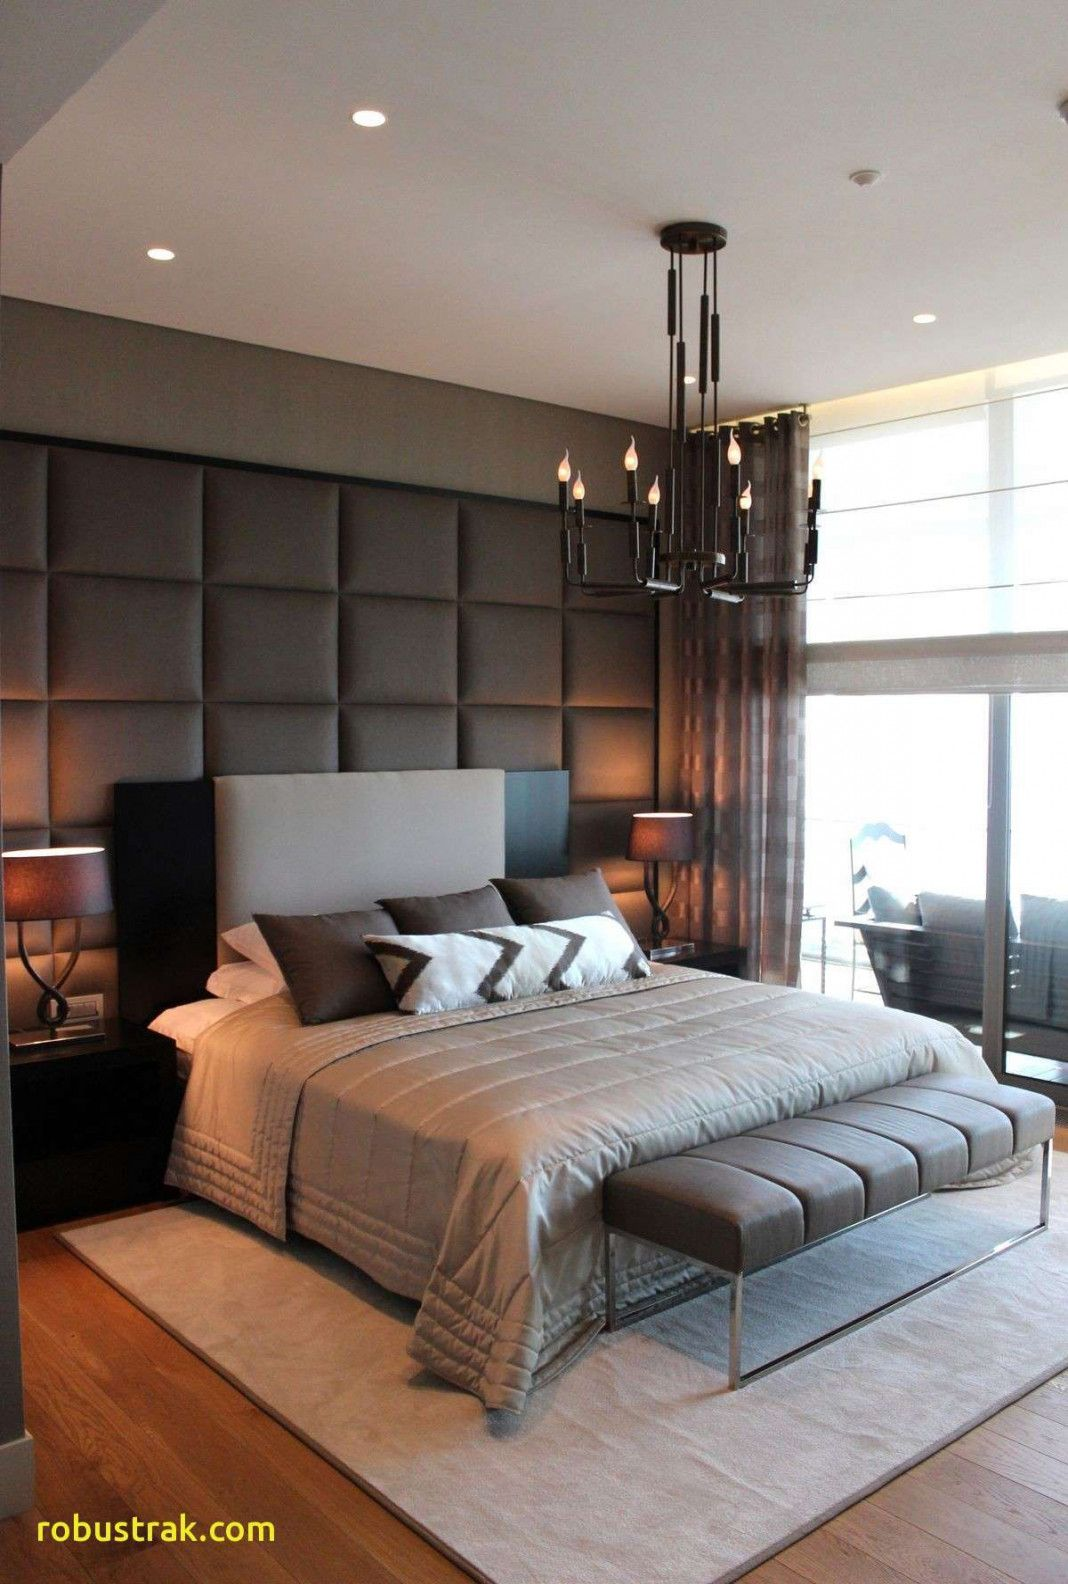 Simple Bedroom 30 Top Modern Bedroom Ideas For Small Rooms Master Bedroom Interior Modern Bedroom Interior Master Bedroom Interior Design